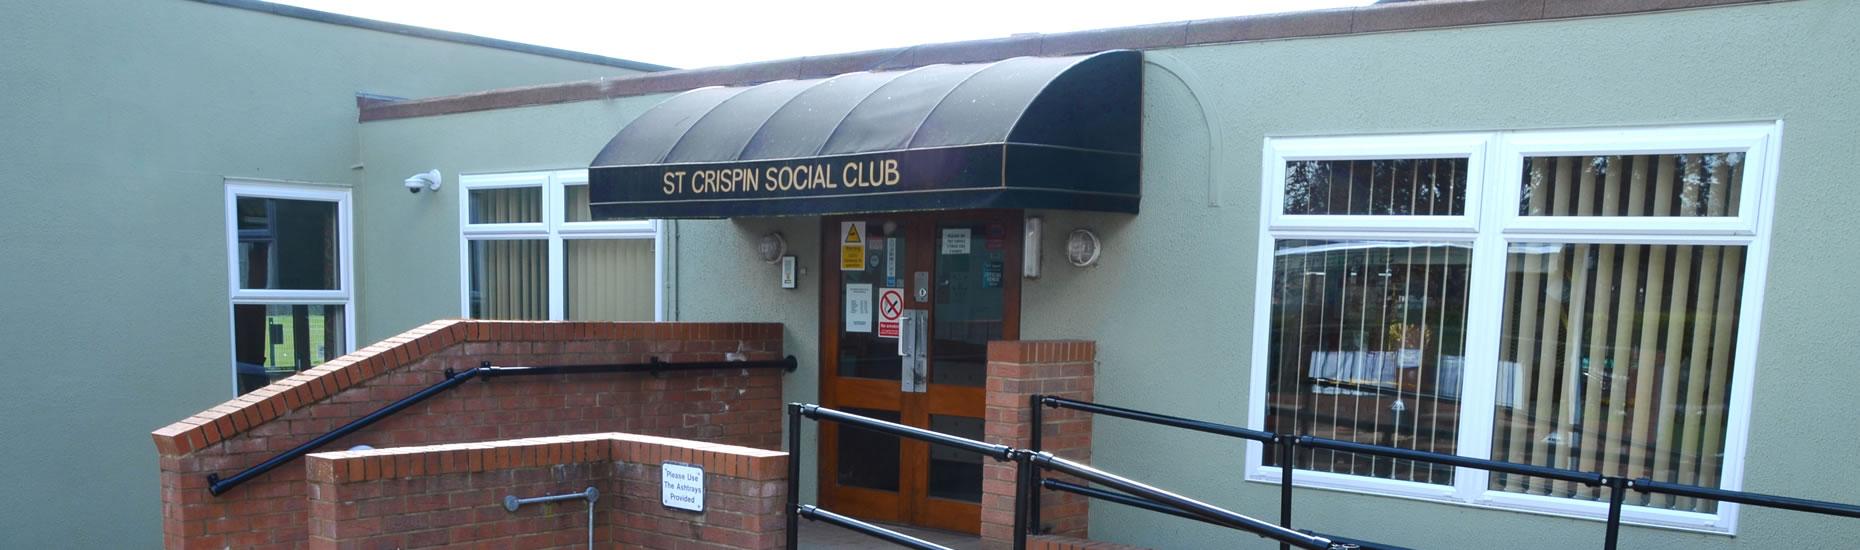 St Crispin Social Club Slider Image